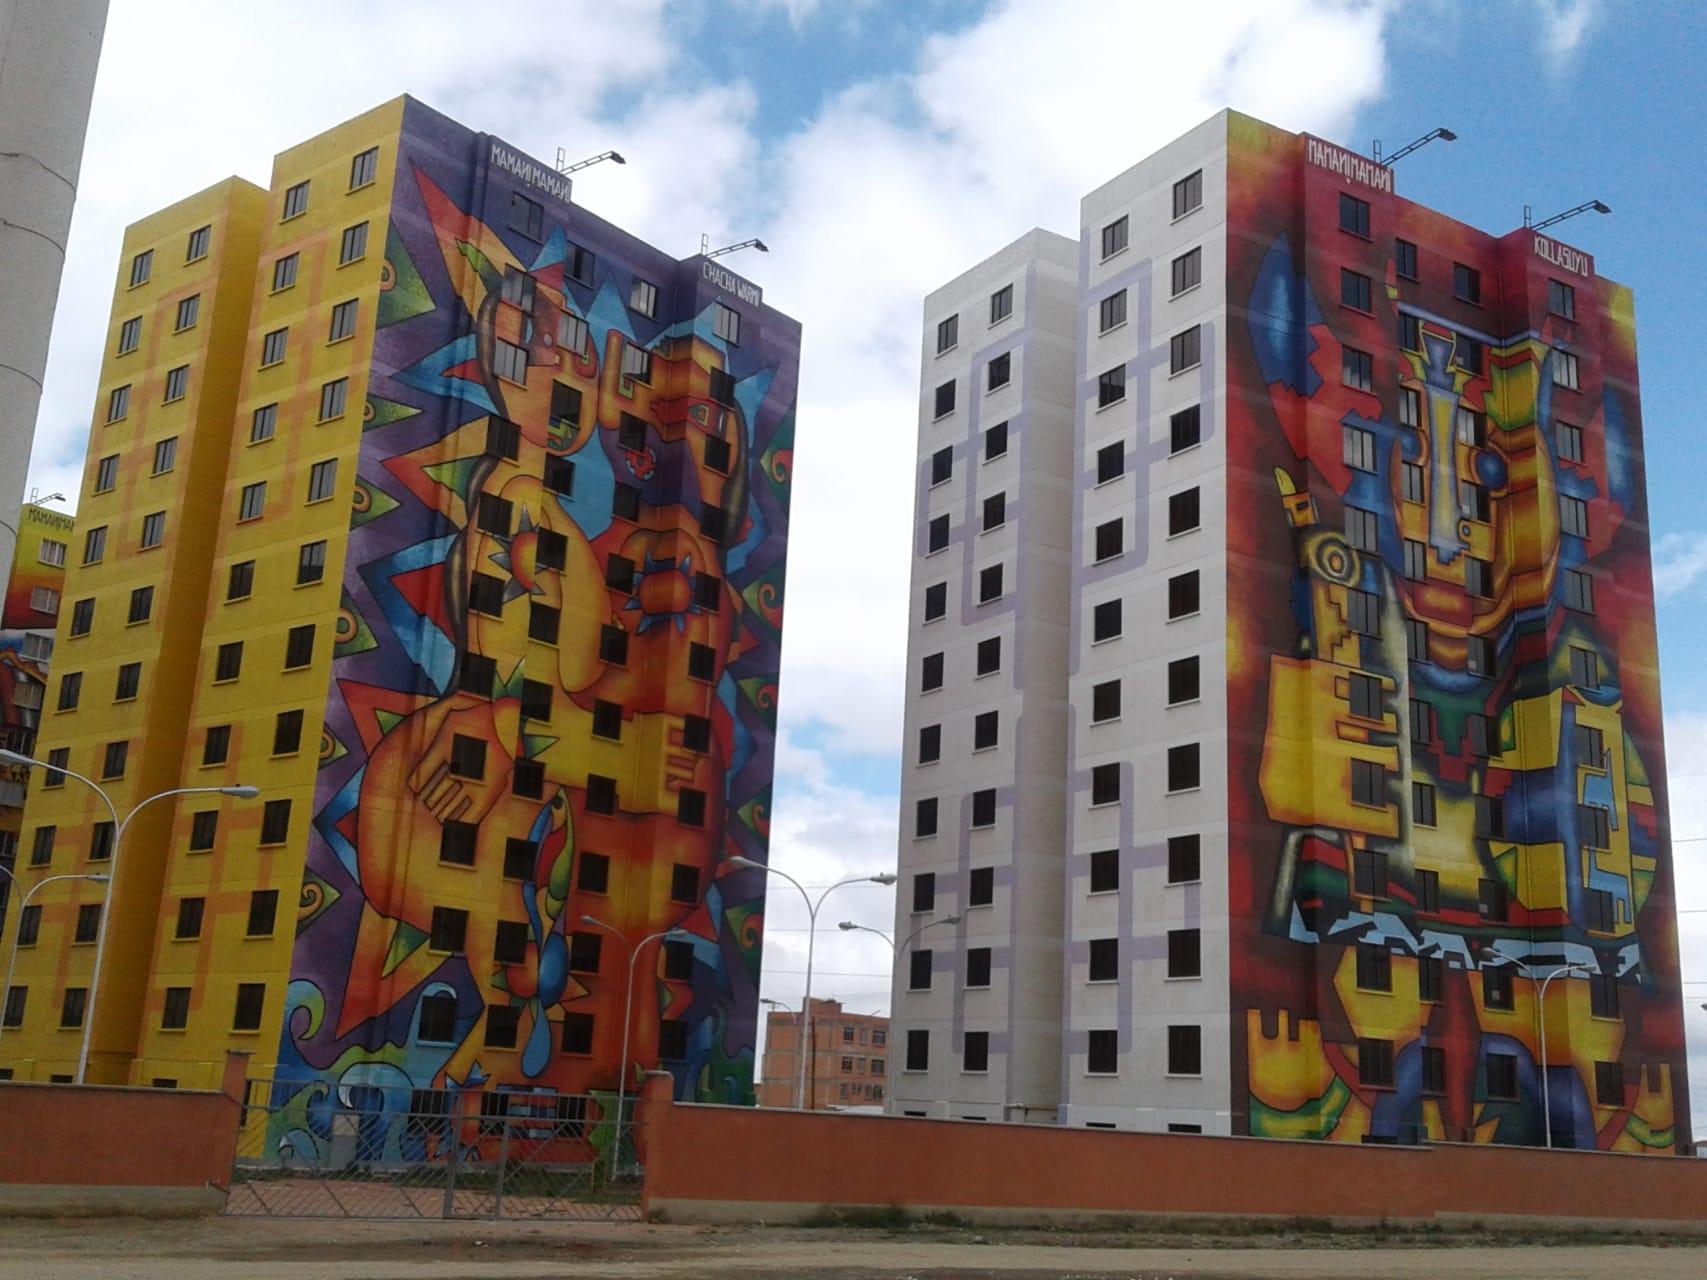 La Paz - CITY OF EL ALTO, Architecture (Cholets), Murals, Churches